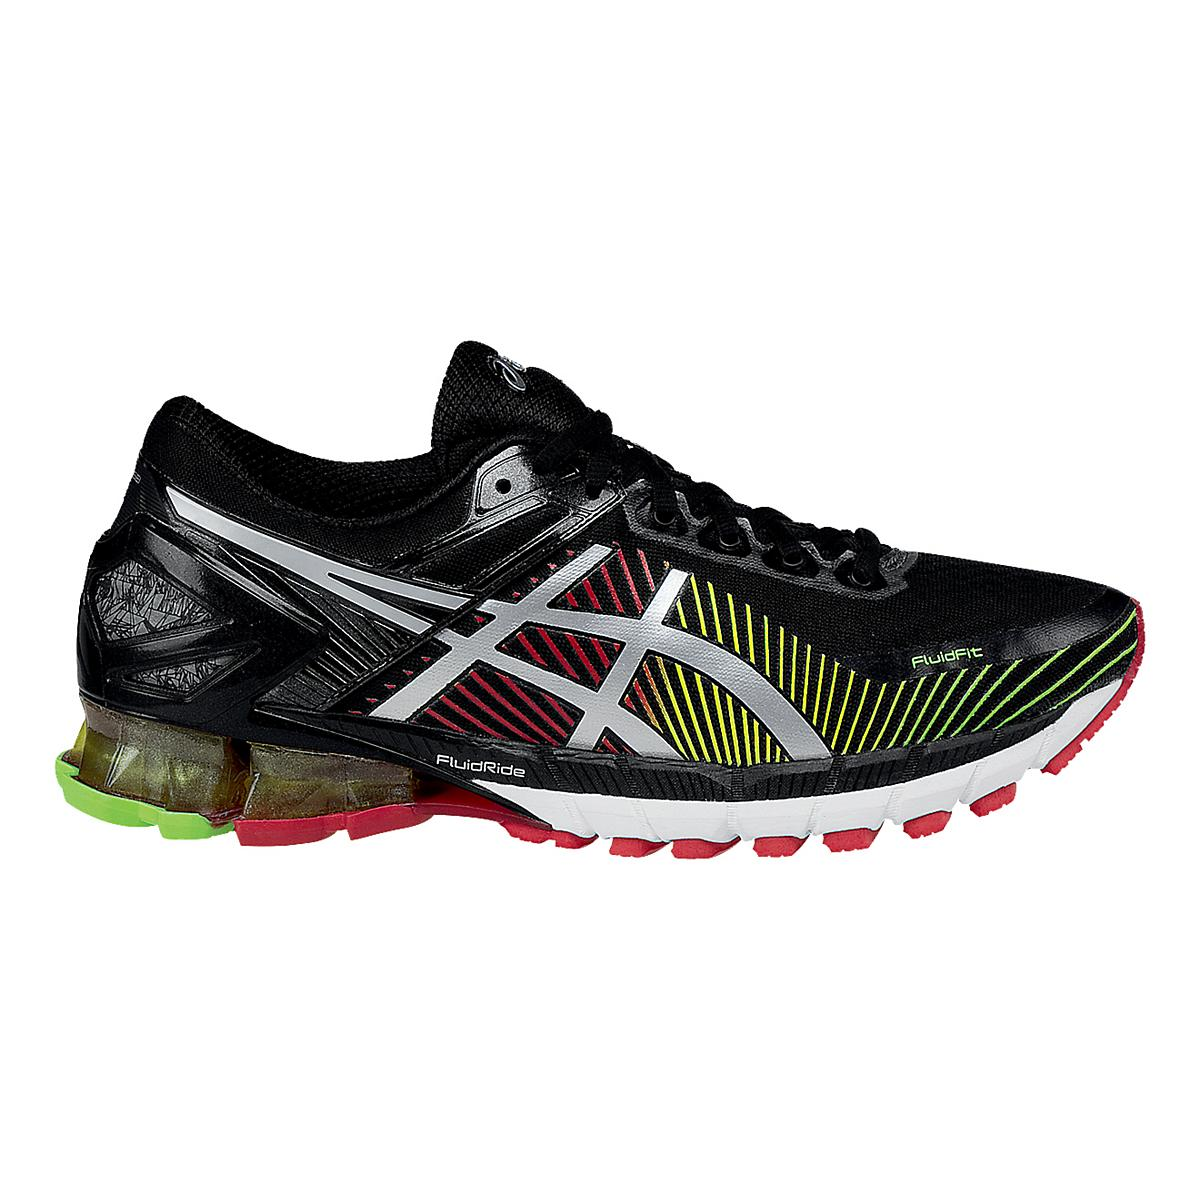 mens asics gel nimbus 18 running shoe at road runner sports. Black Bedroom Furniture Sets. Home Design Ideas